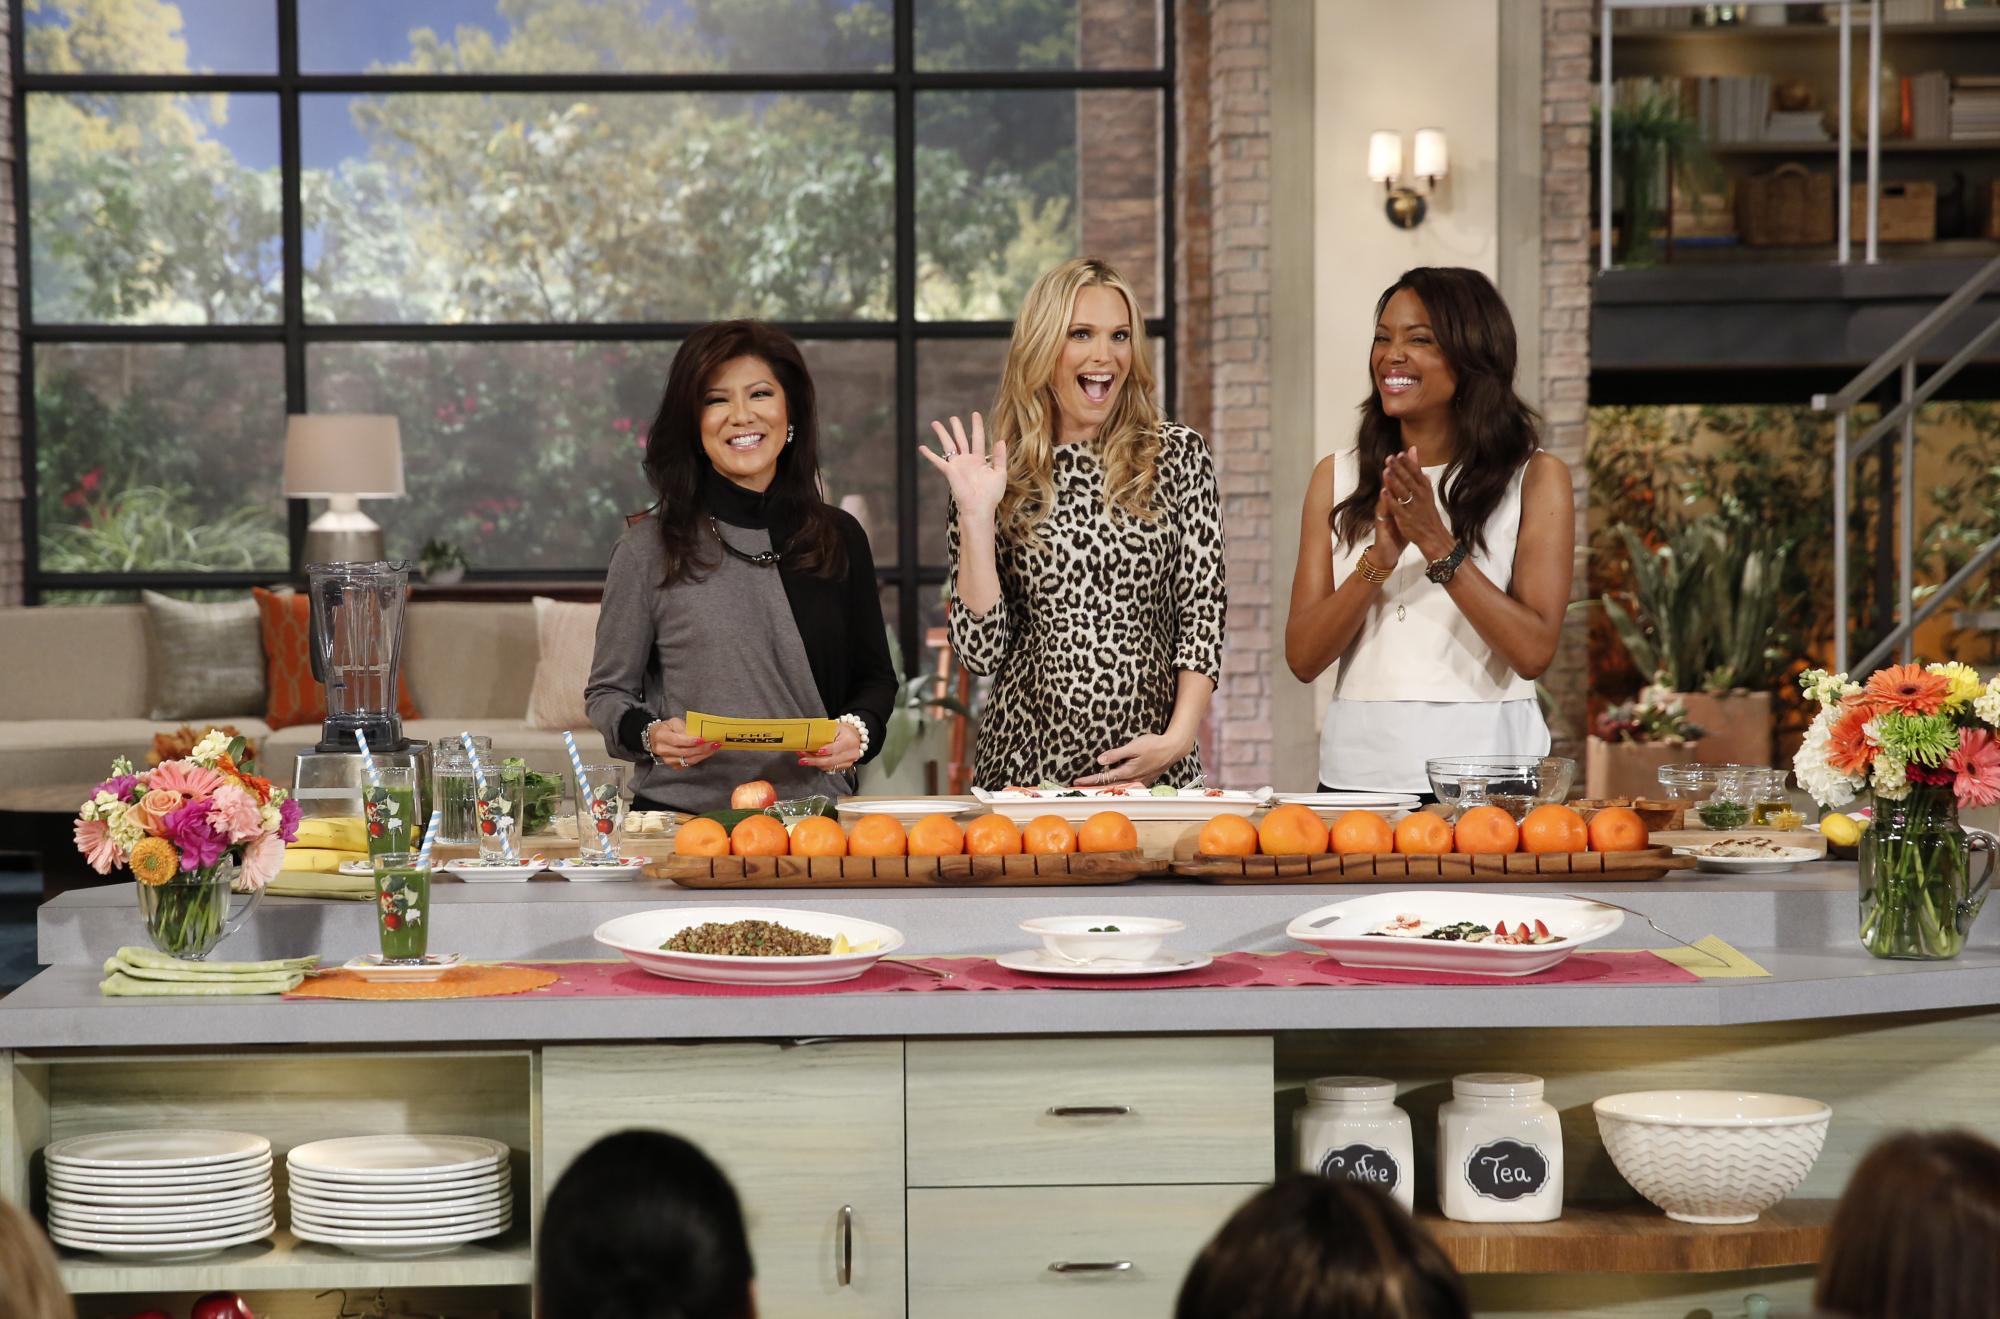 8. Molly Sims shared healthy recipes.